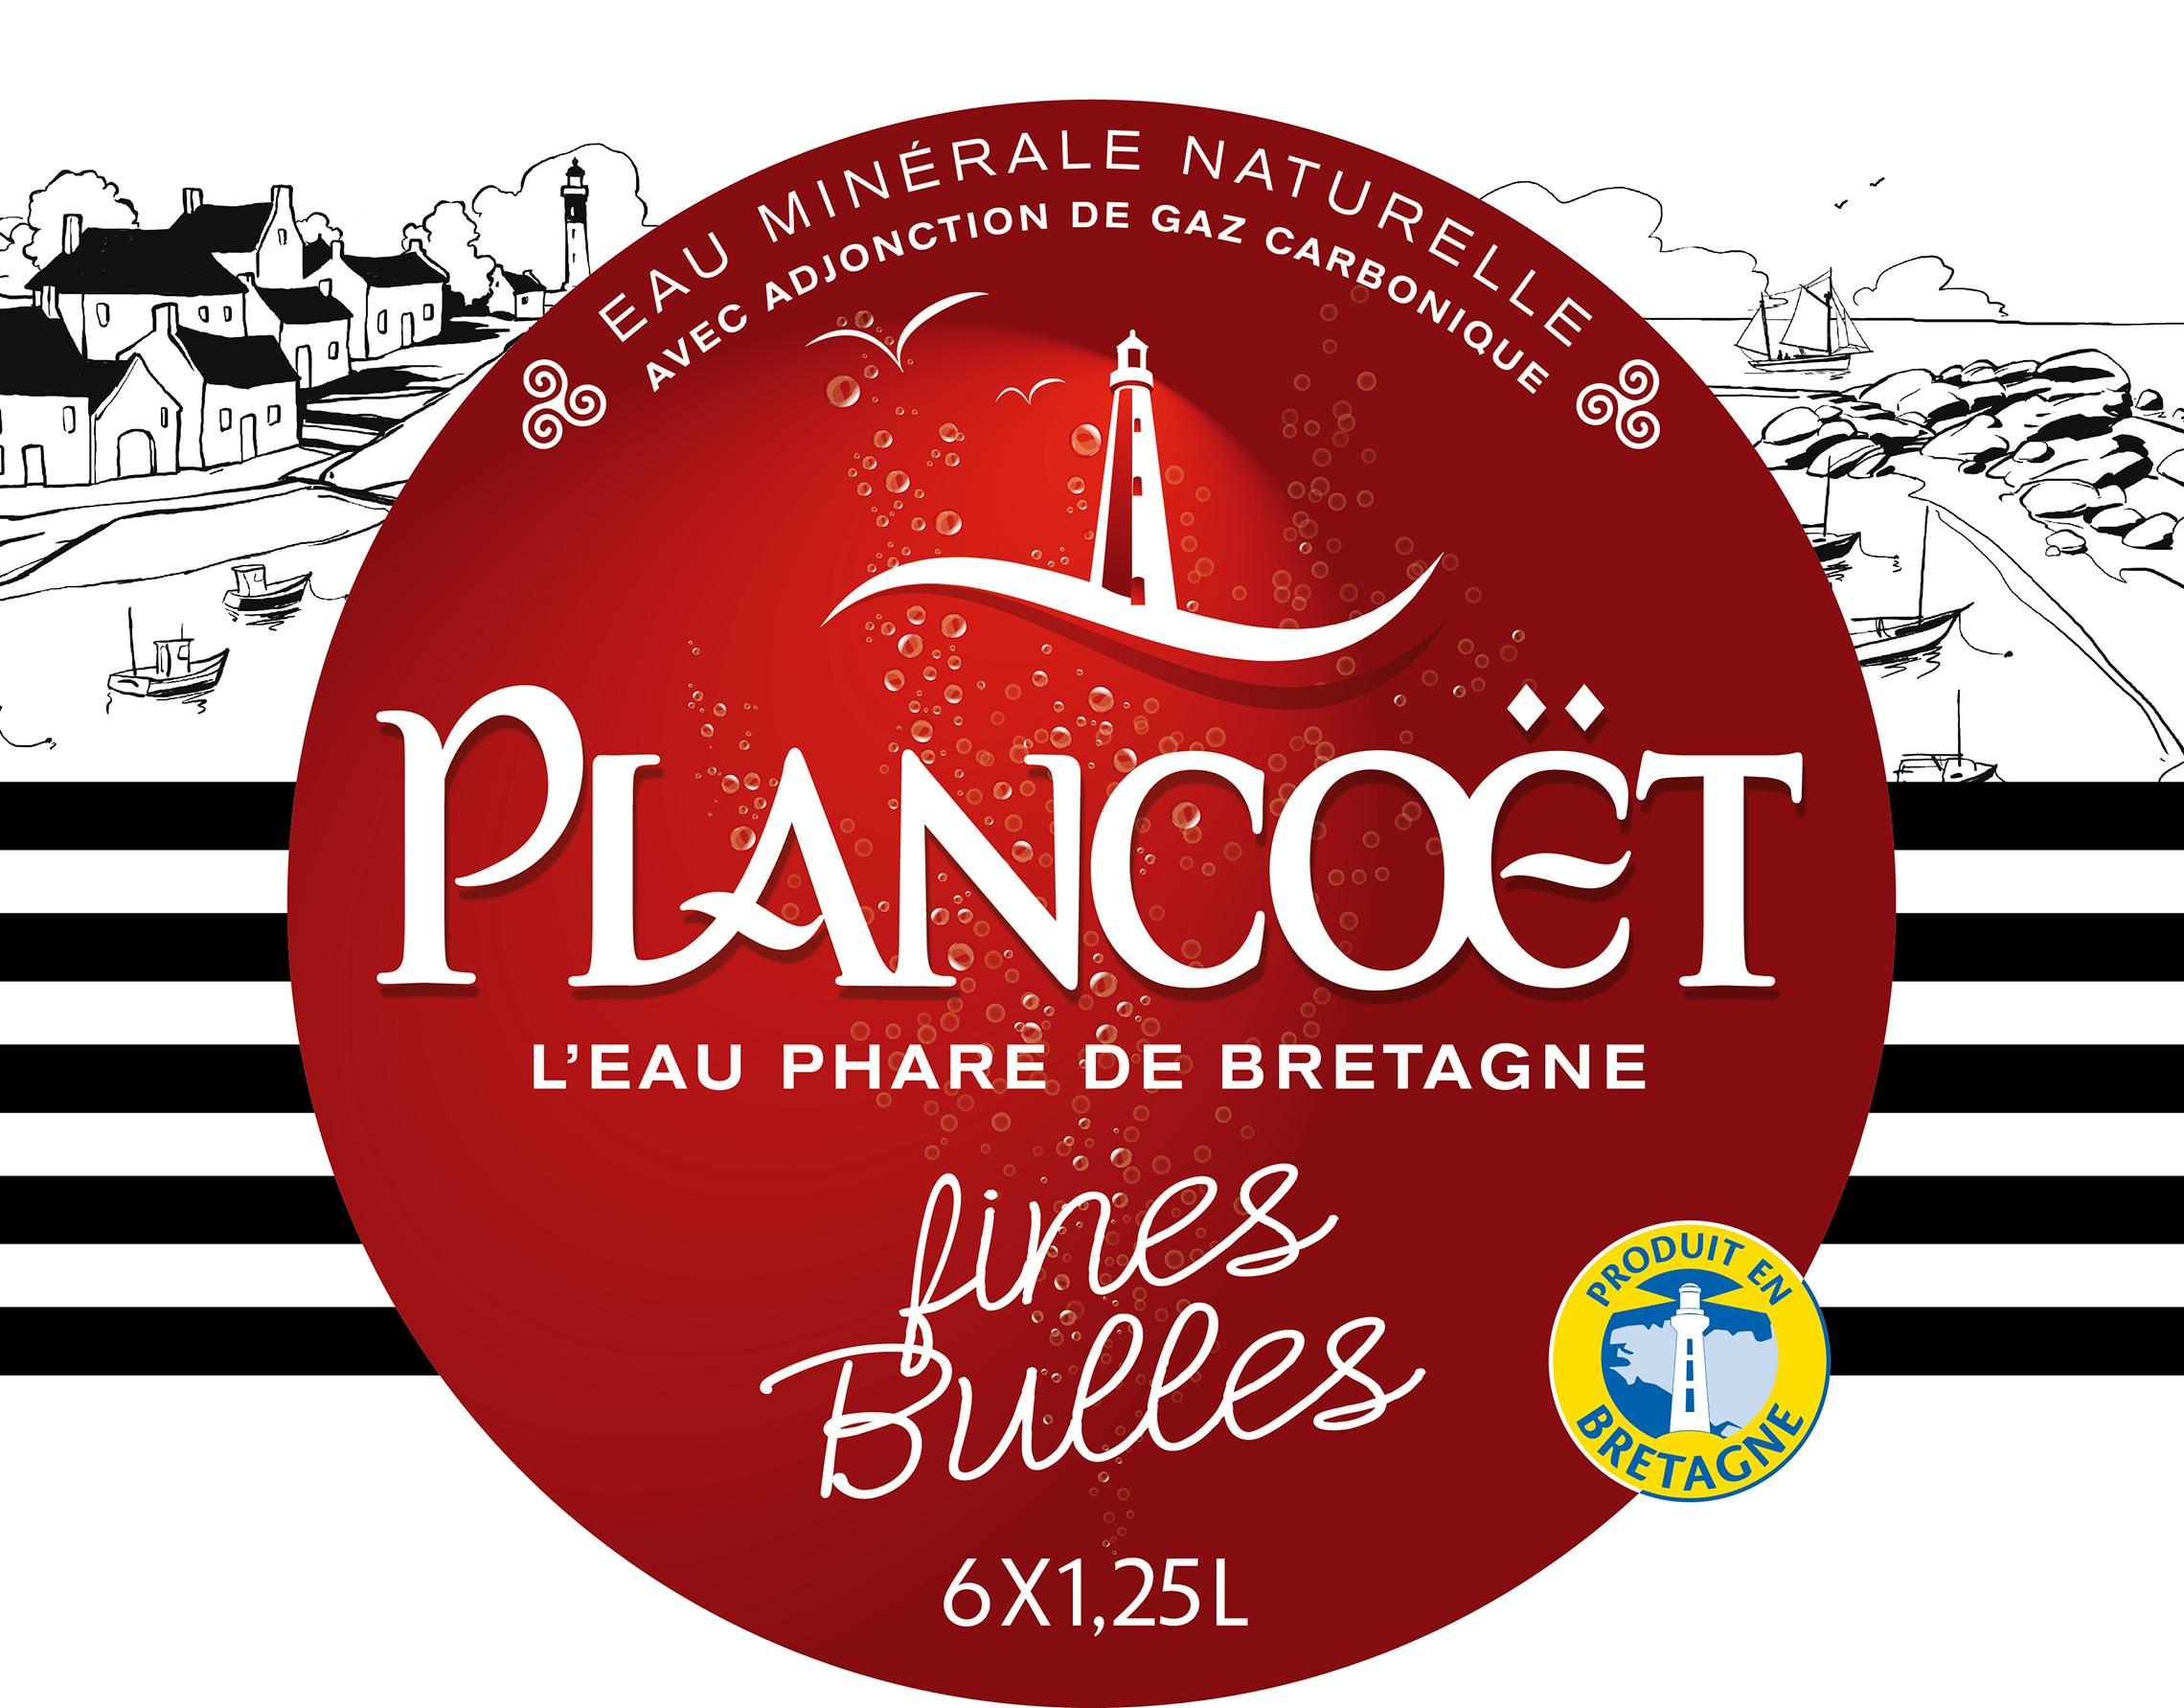 Plancoet logo